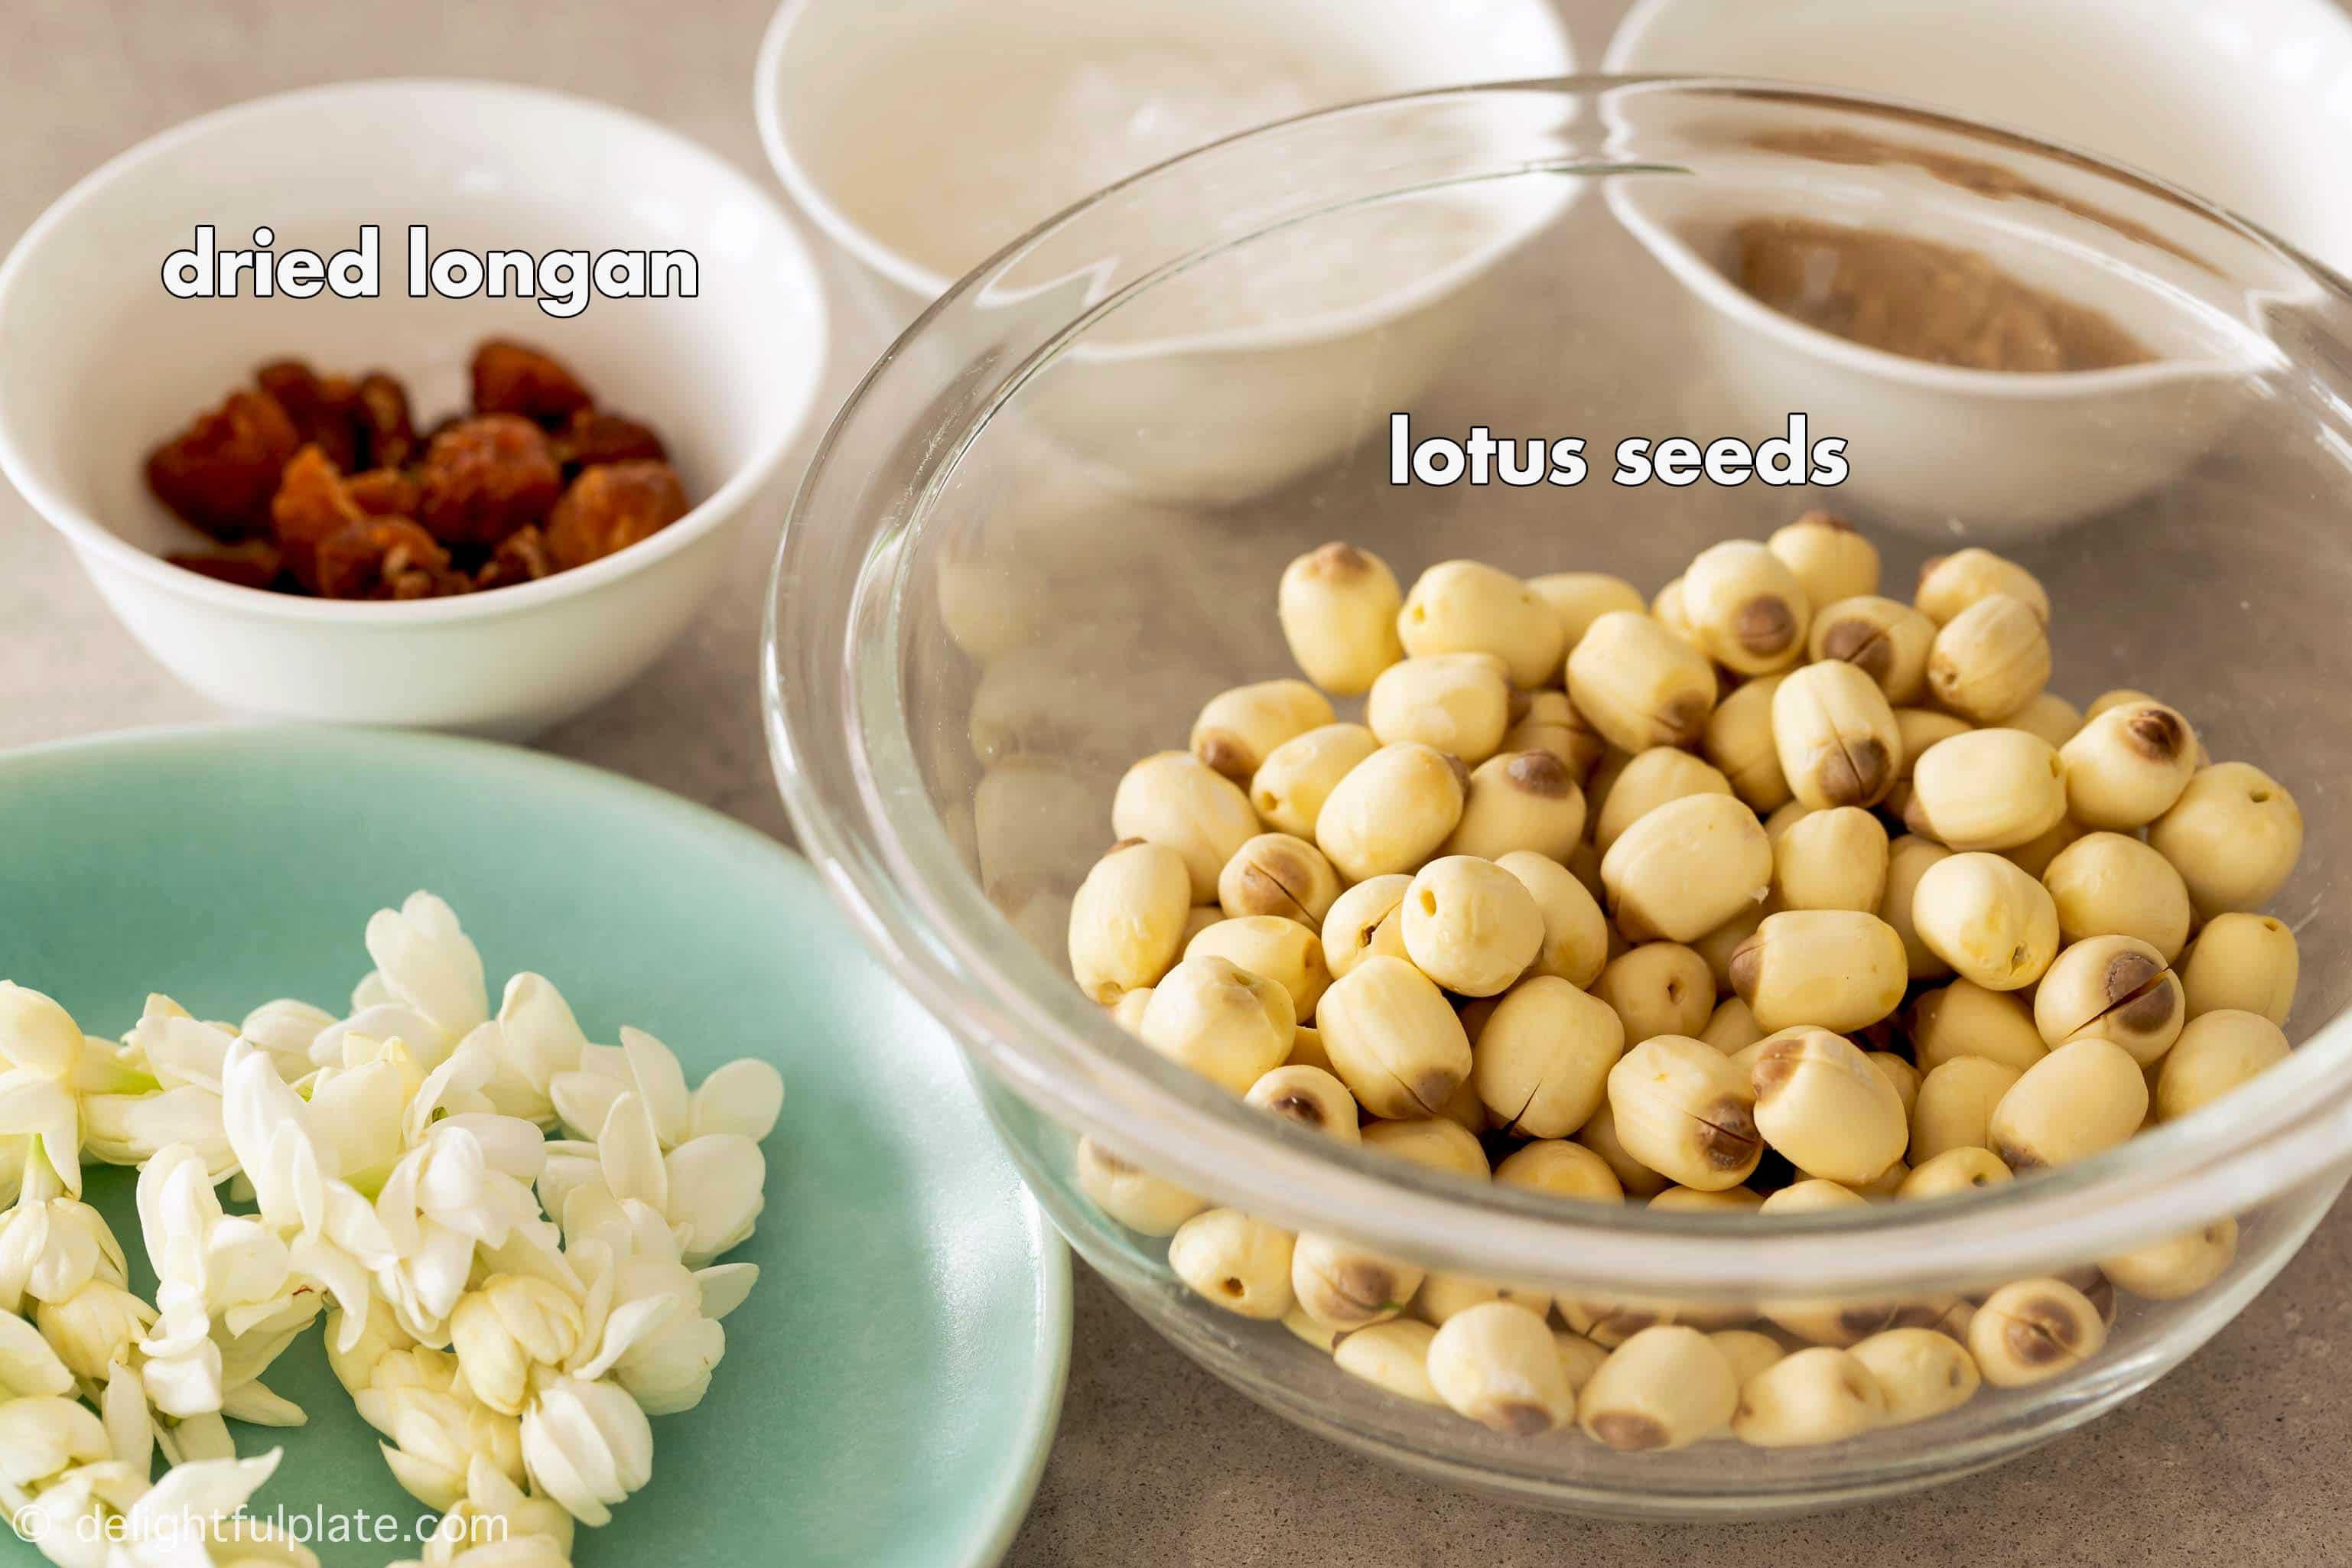 prepping bowls containing lotus seeds, dried longan, rock sugar and light brown sugar